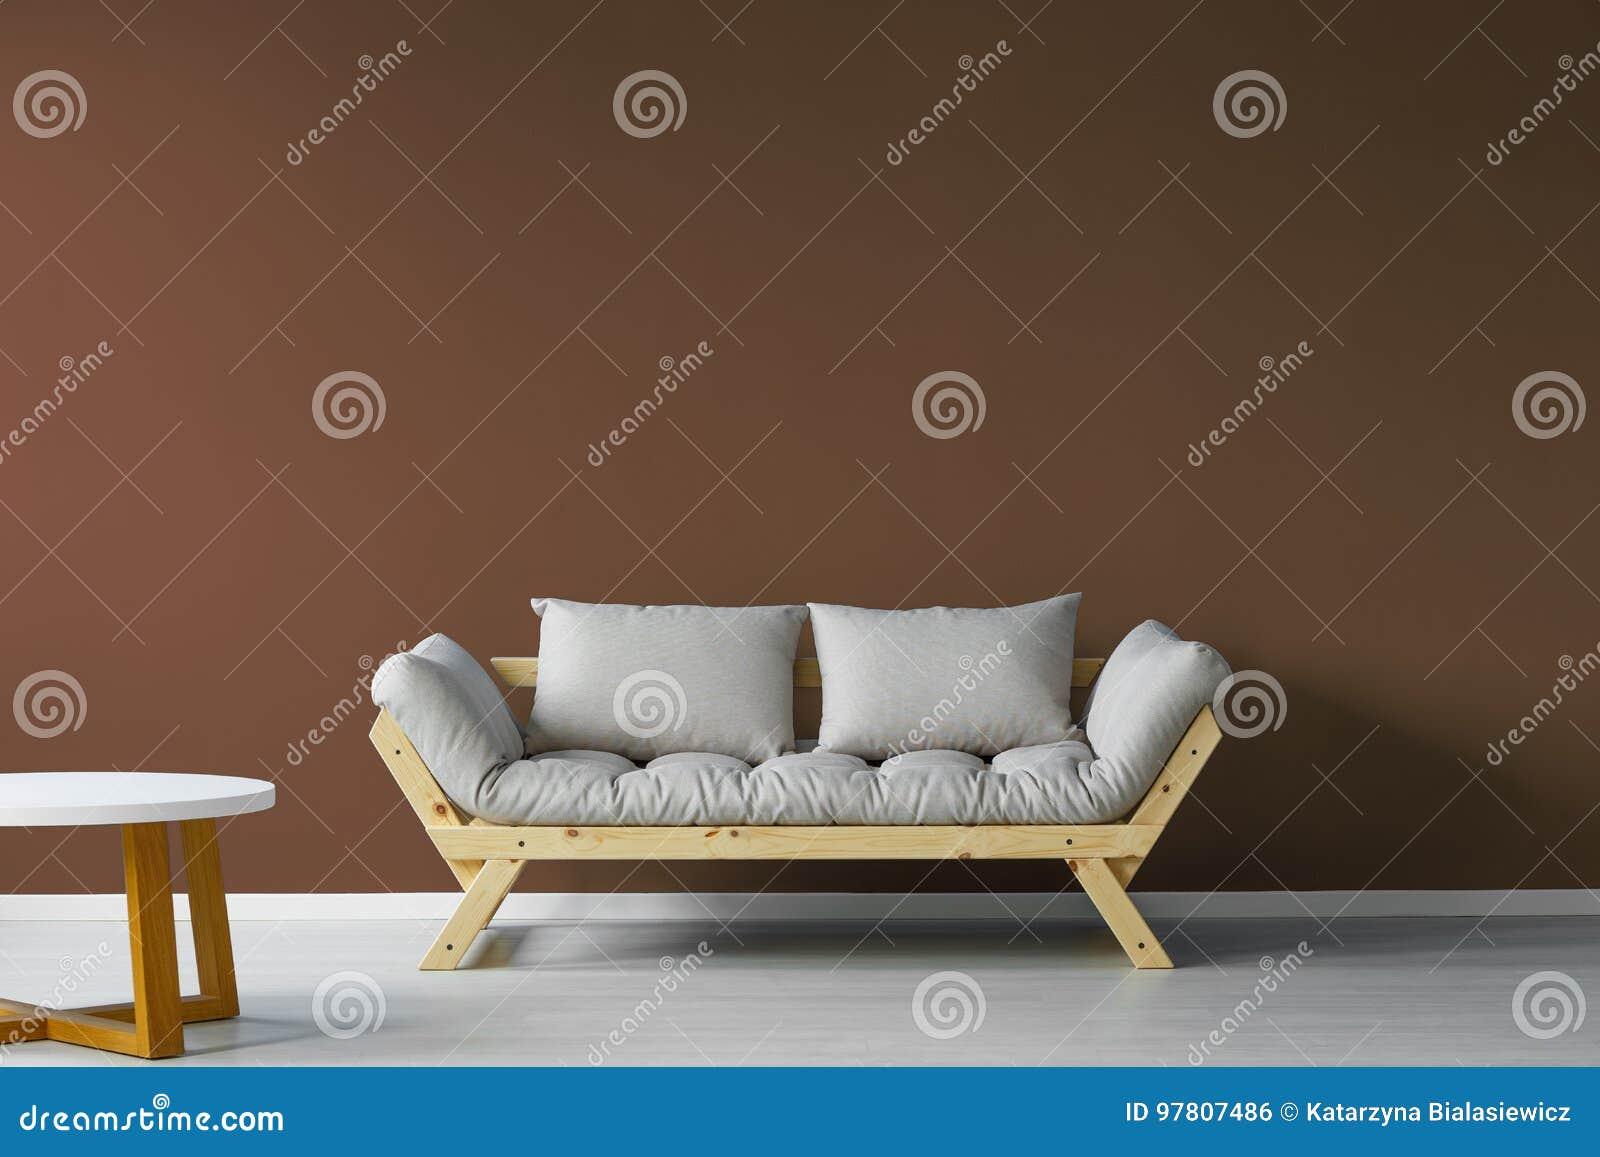 Minimalistic, interior escandinavo da sala de dia